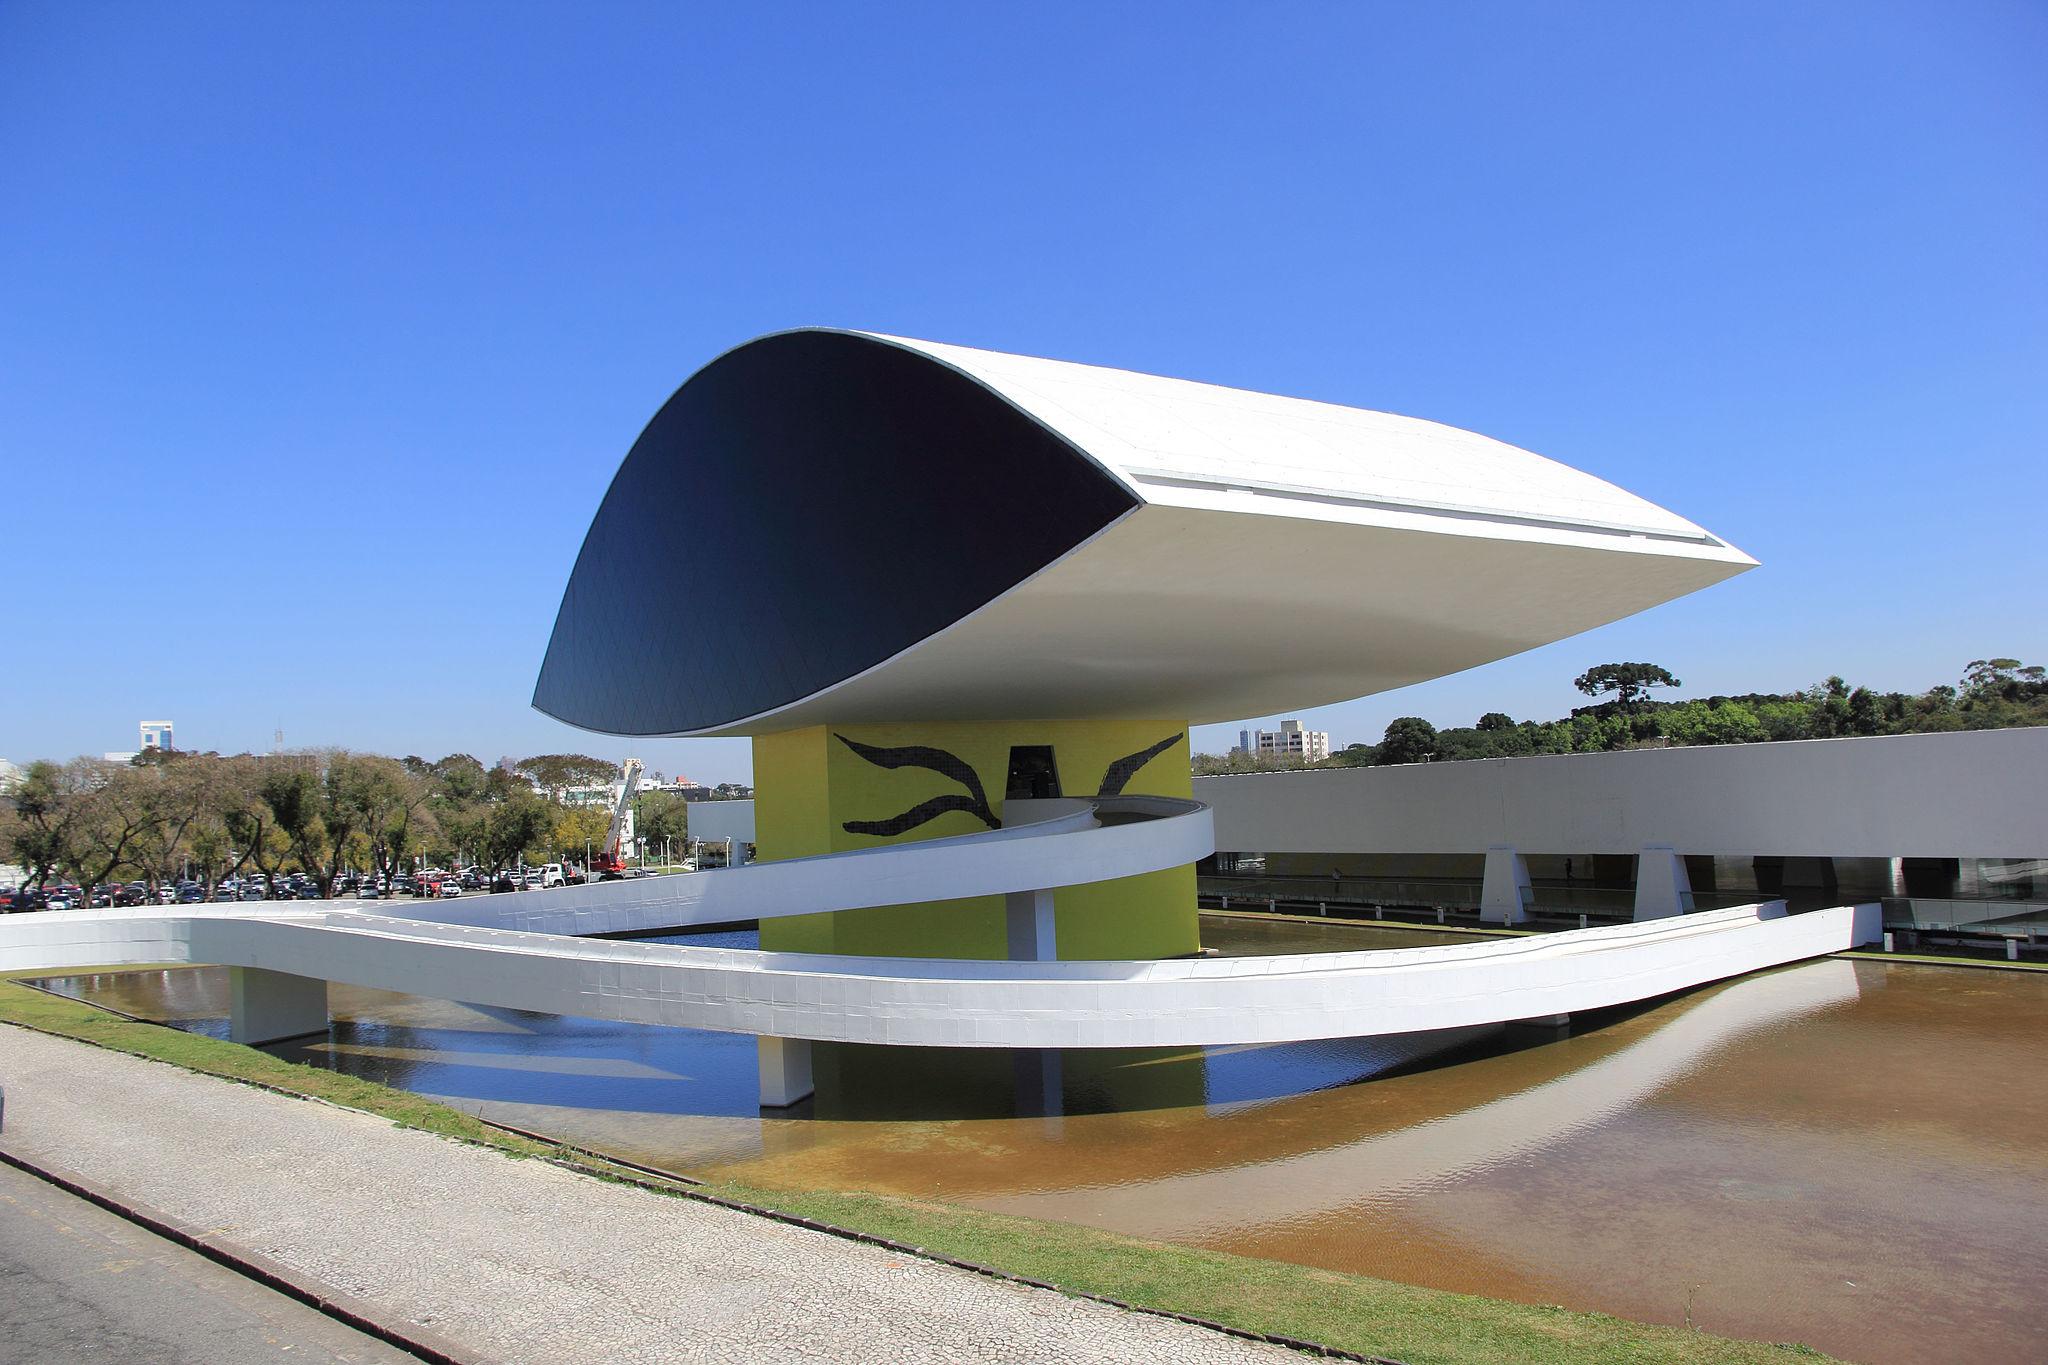 Museu Oscar Niemeyer by Halley Pacheco de Oliveira